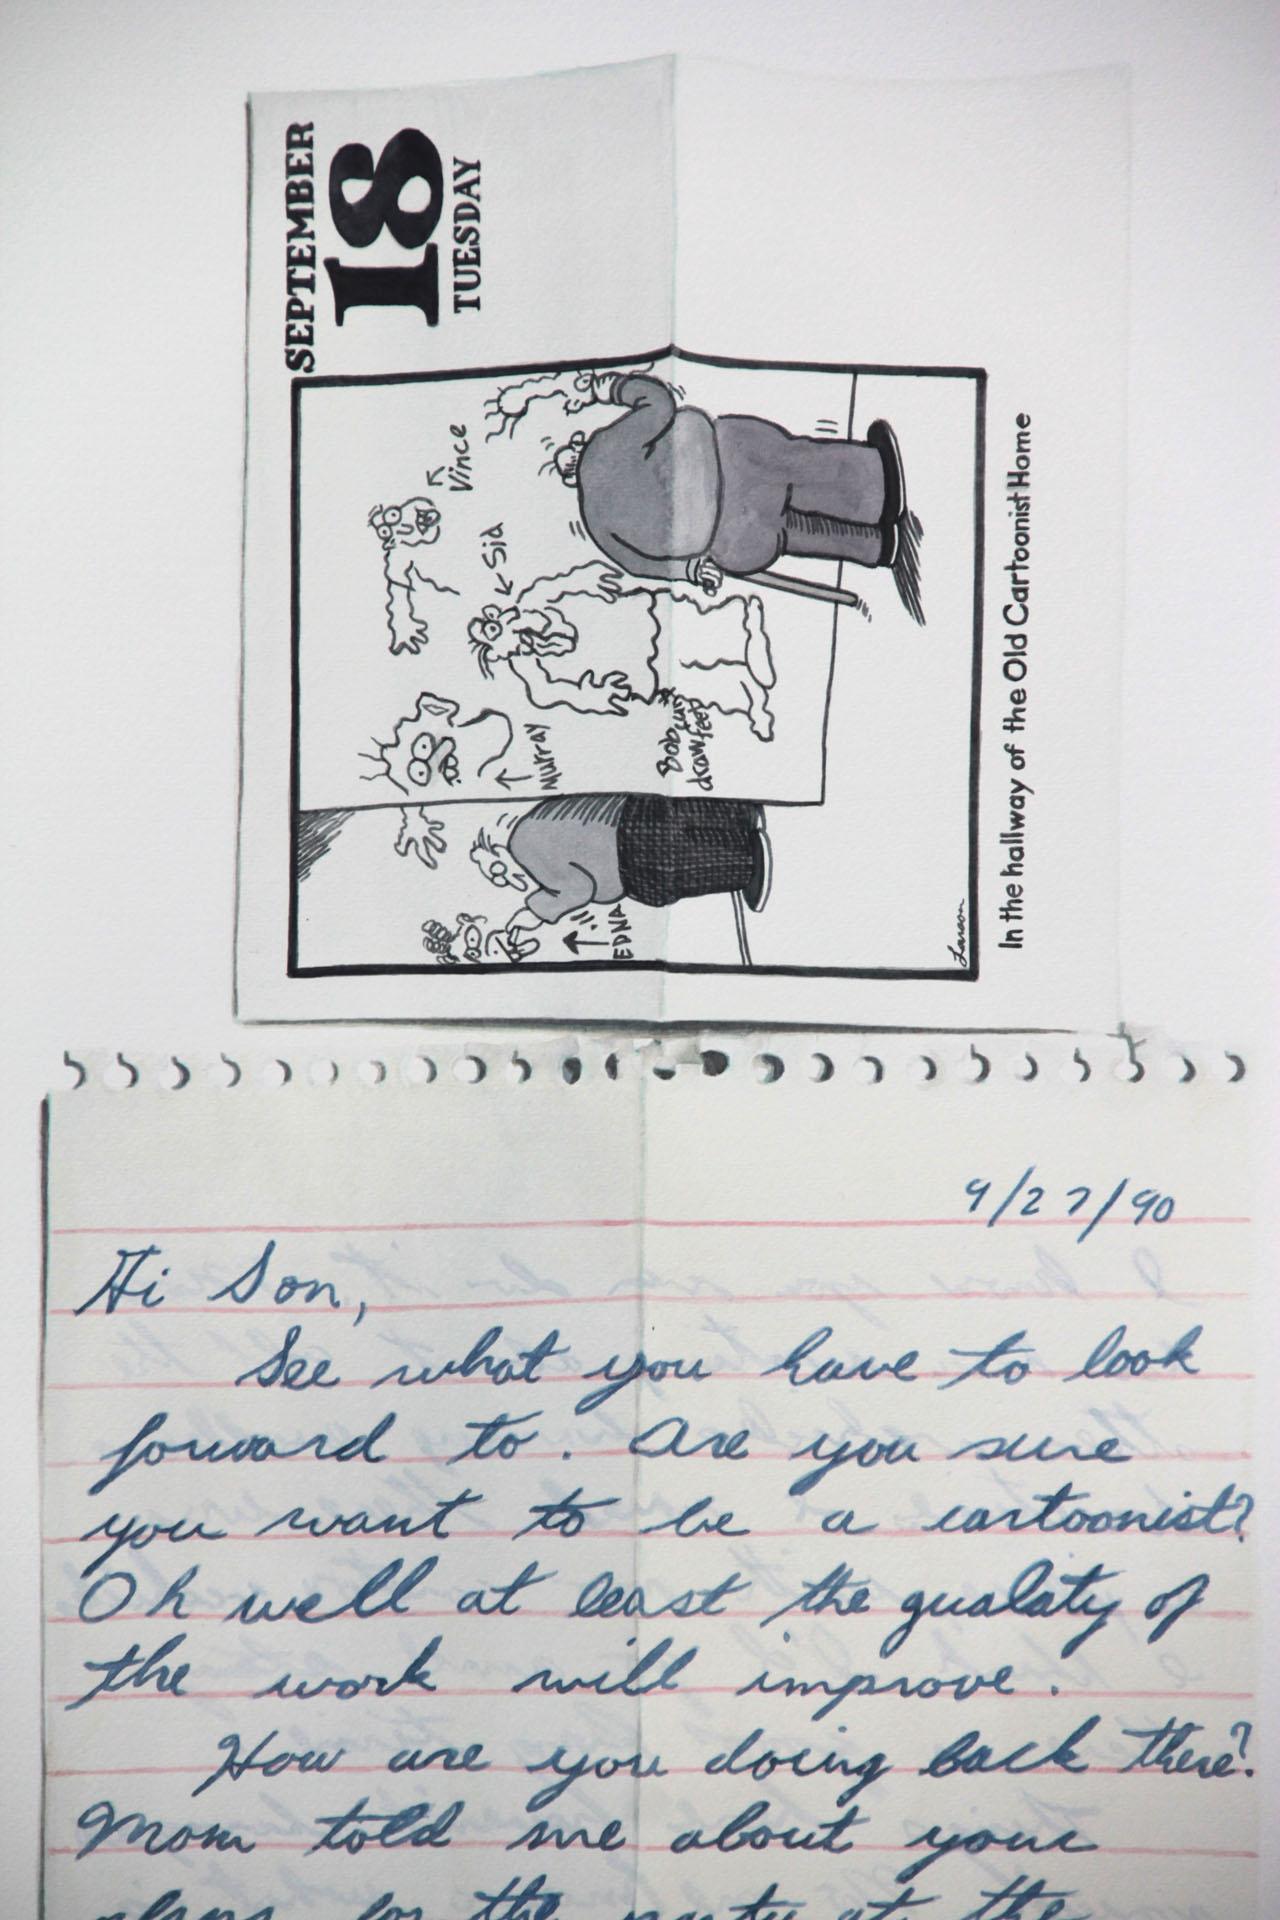 Cartoonist, 9/27/90 (DETAIL)